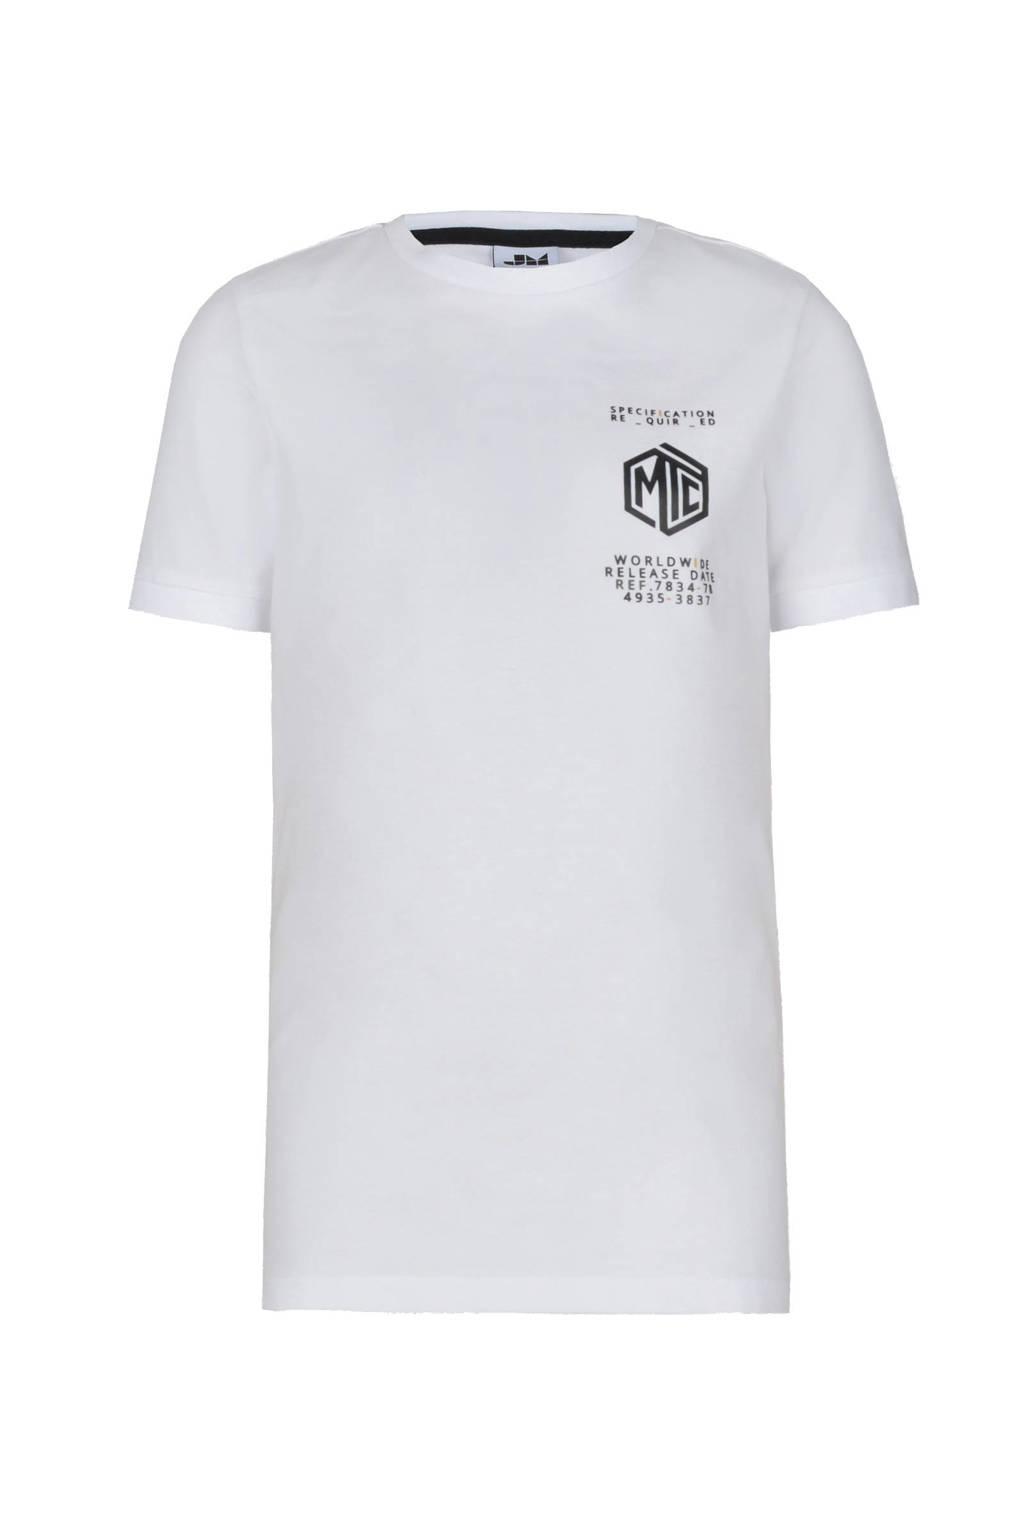 Jill & Mitch by Shoeby slim fit T-shirt Lars met printopdruk wit/zwart, Wit/zwart